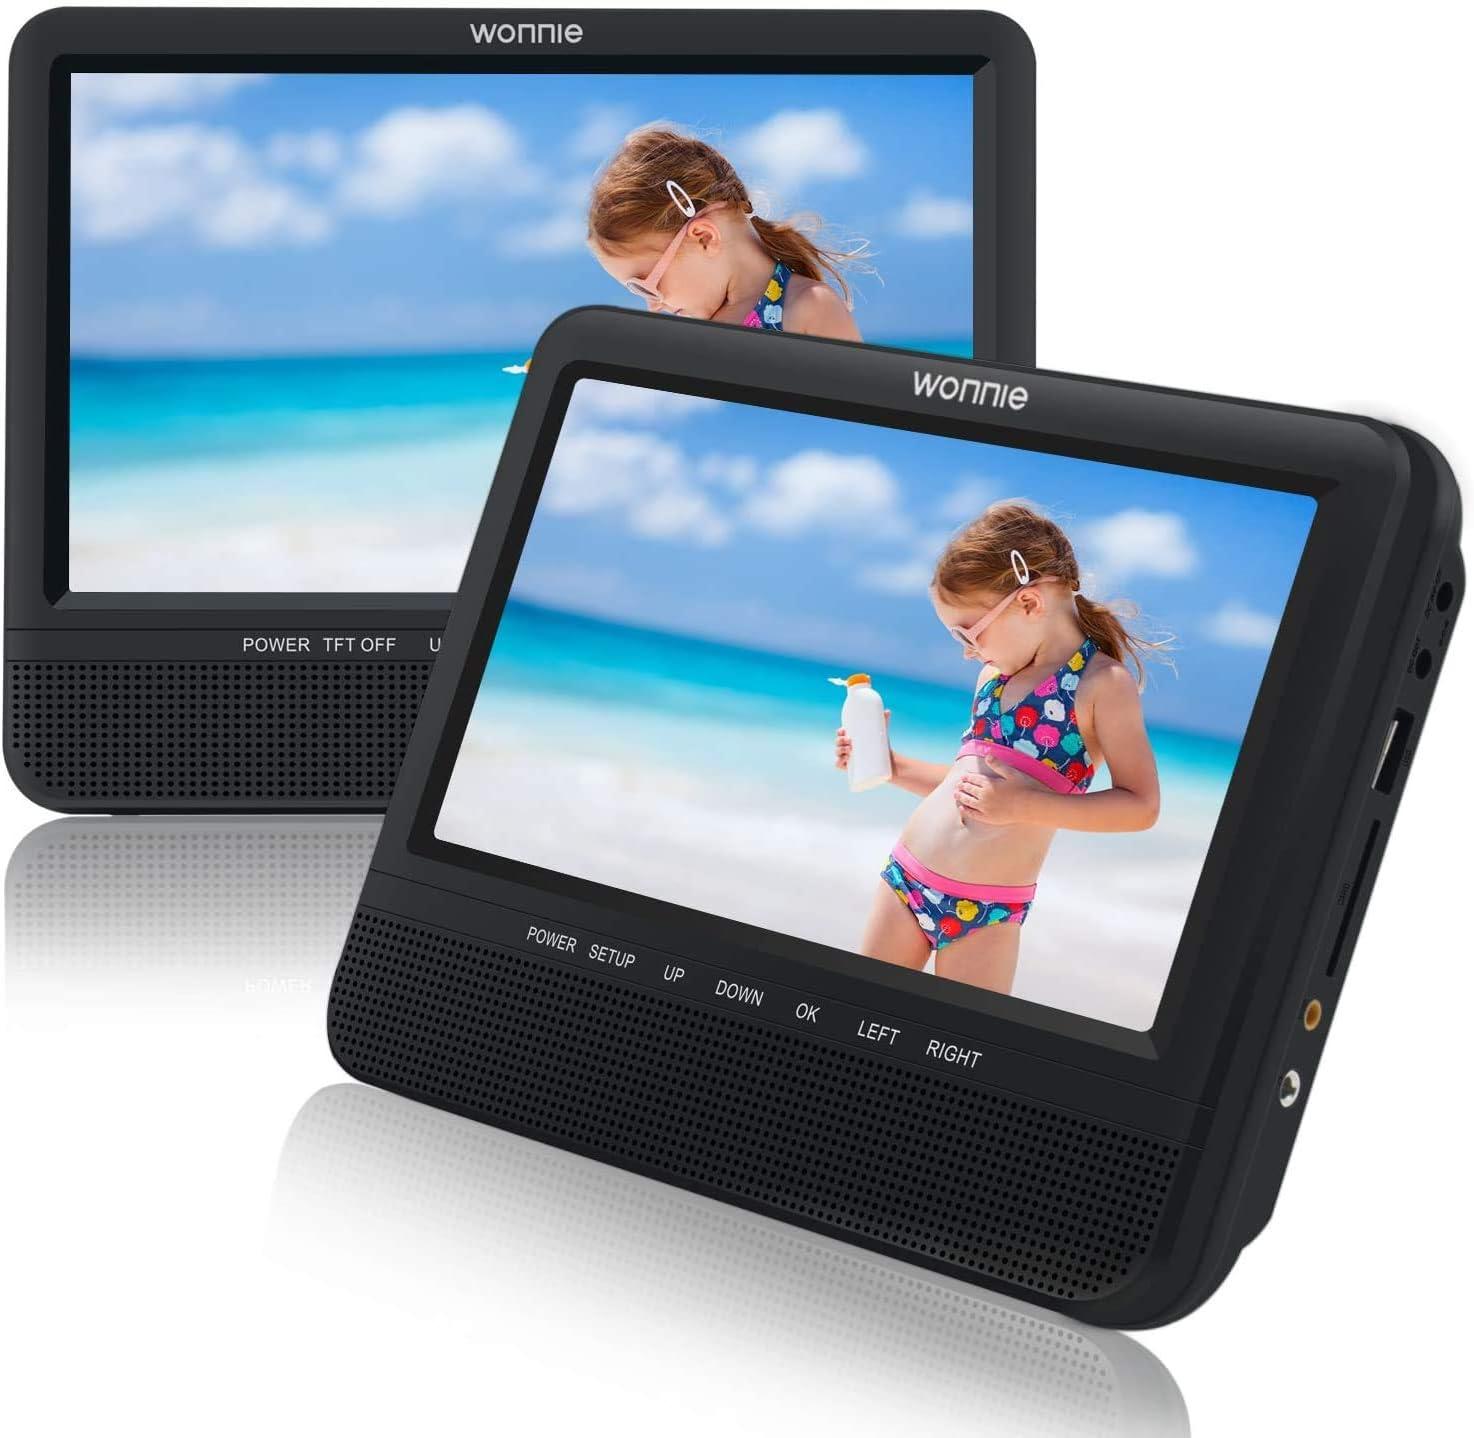 WONNIE 10.5-inch Dual Portable DVD Players